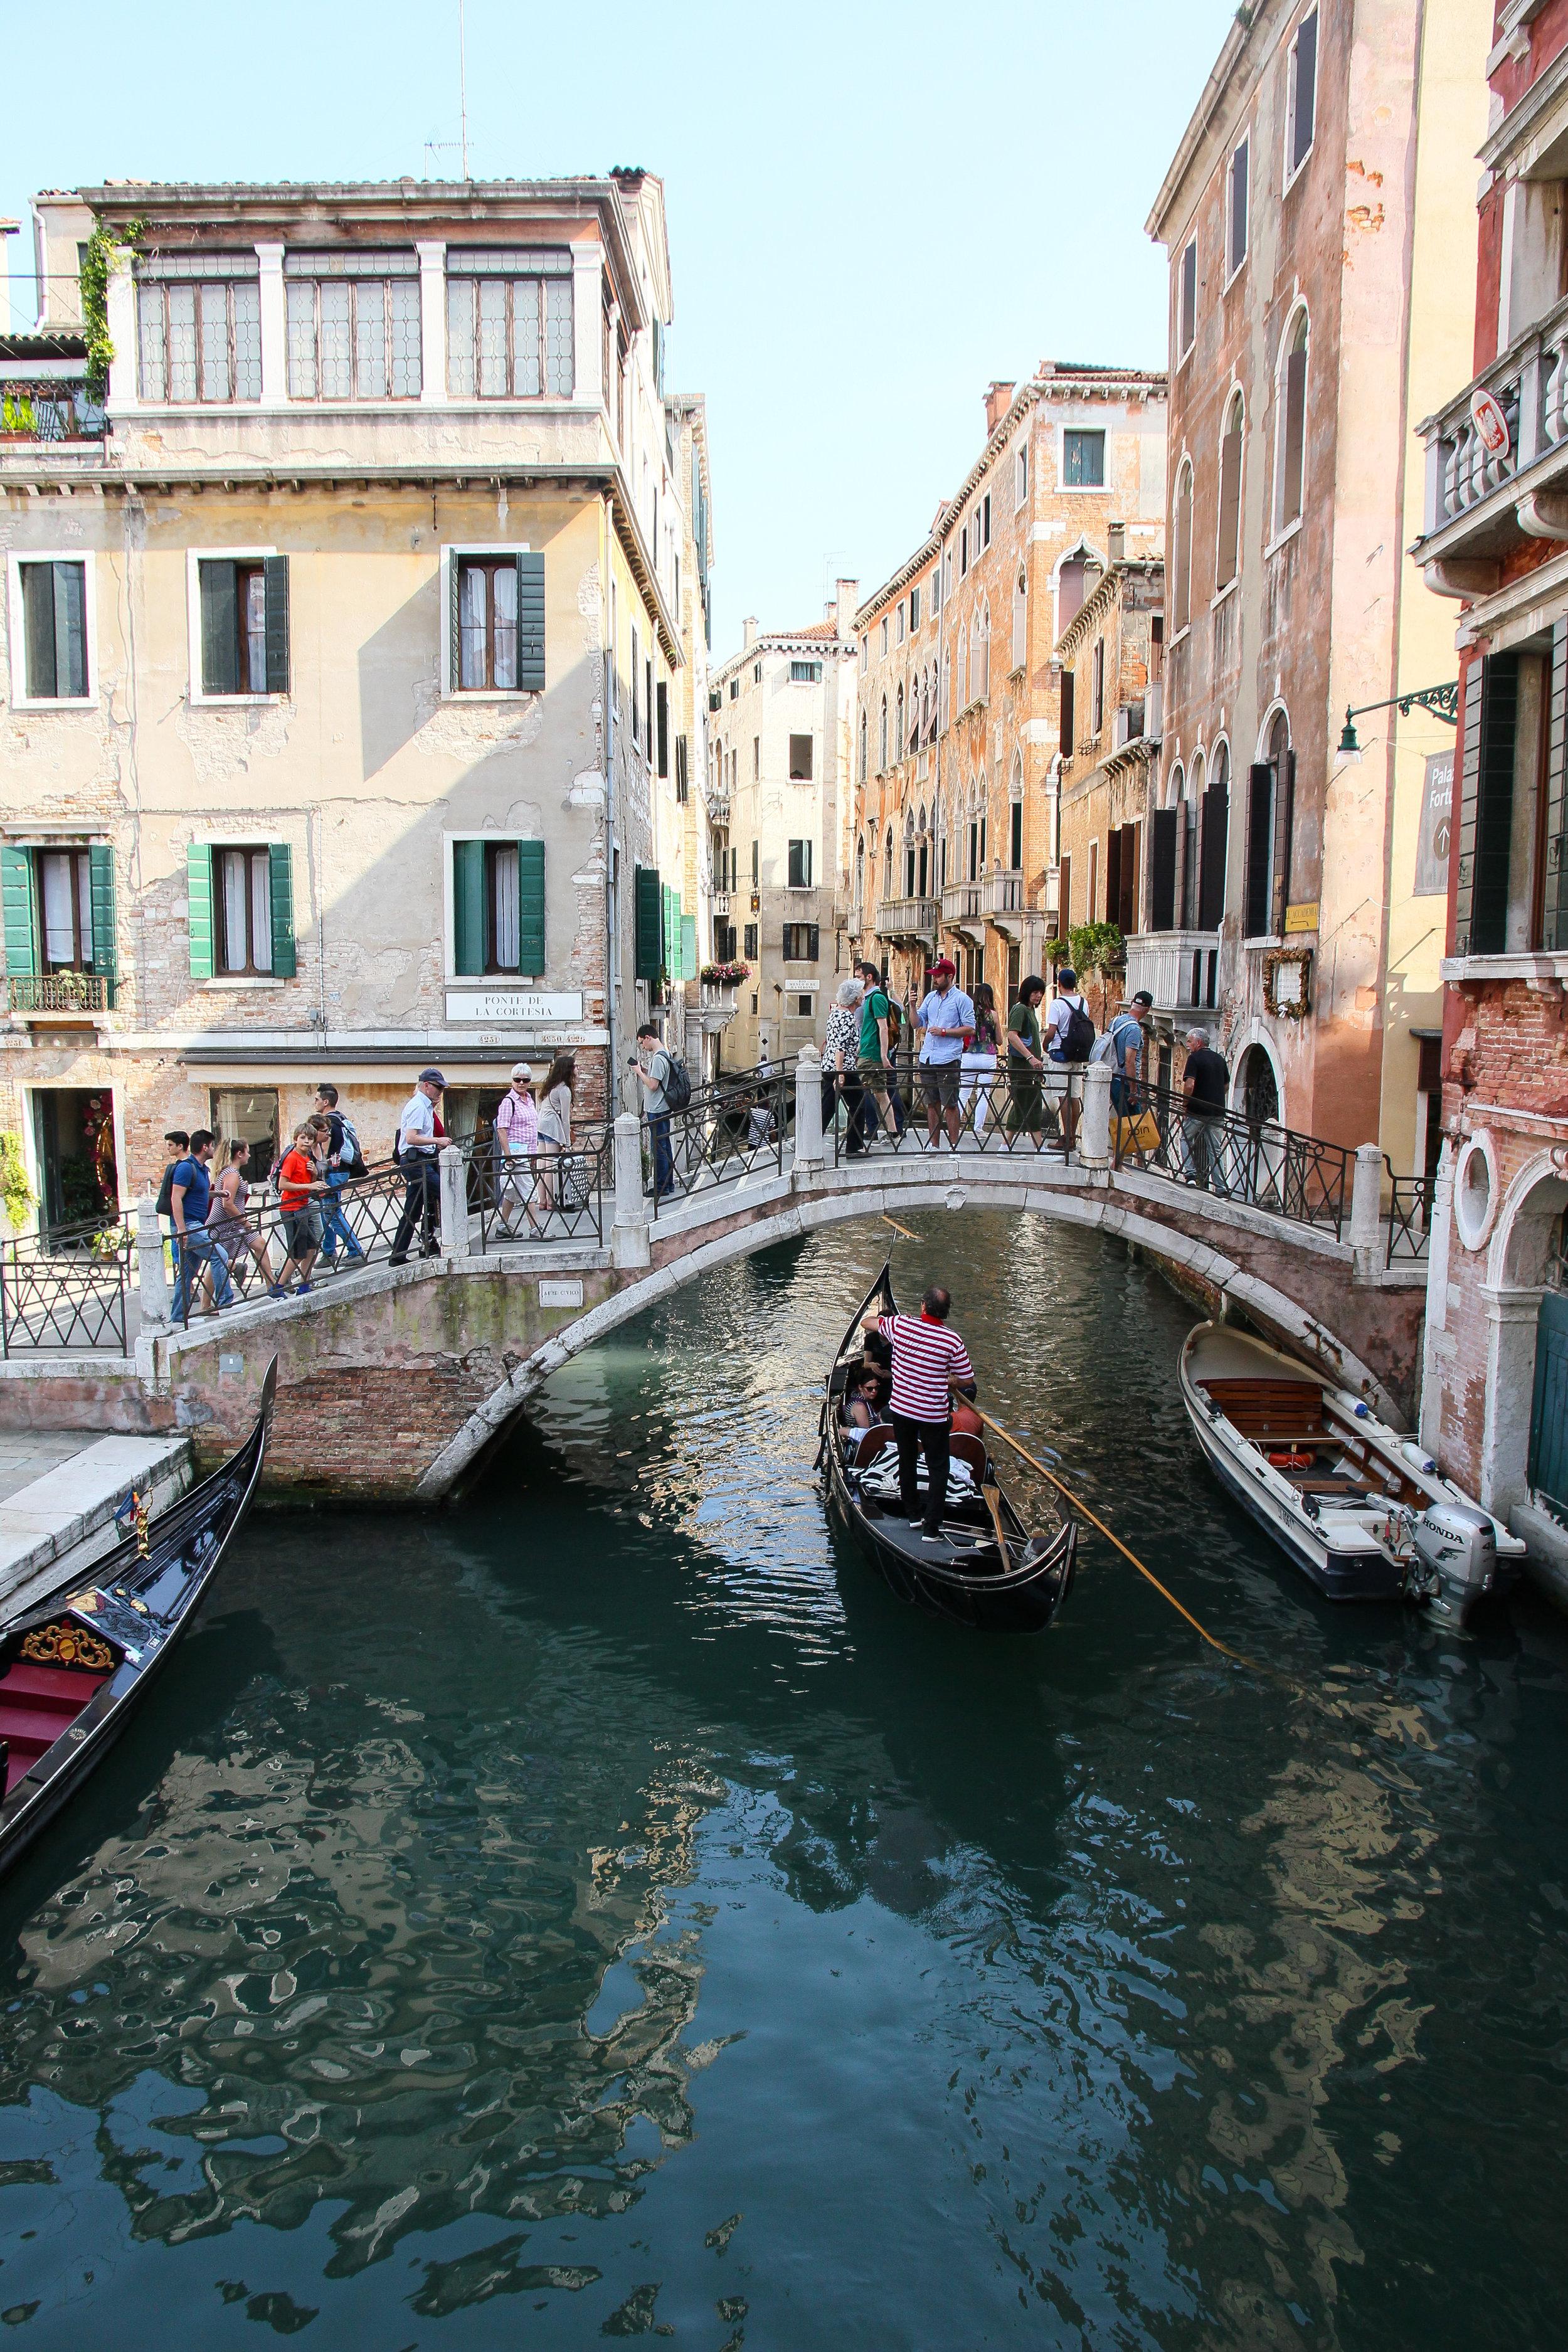 Venice-trip-canals-mum-2018.JPG